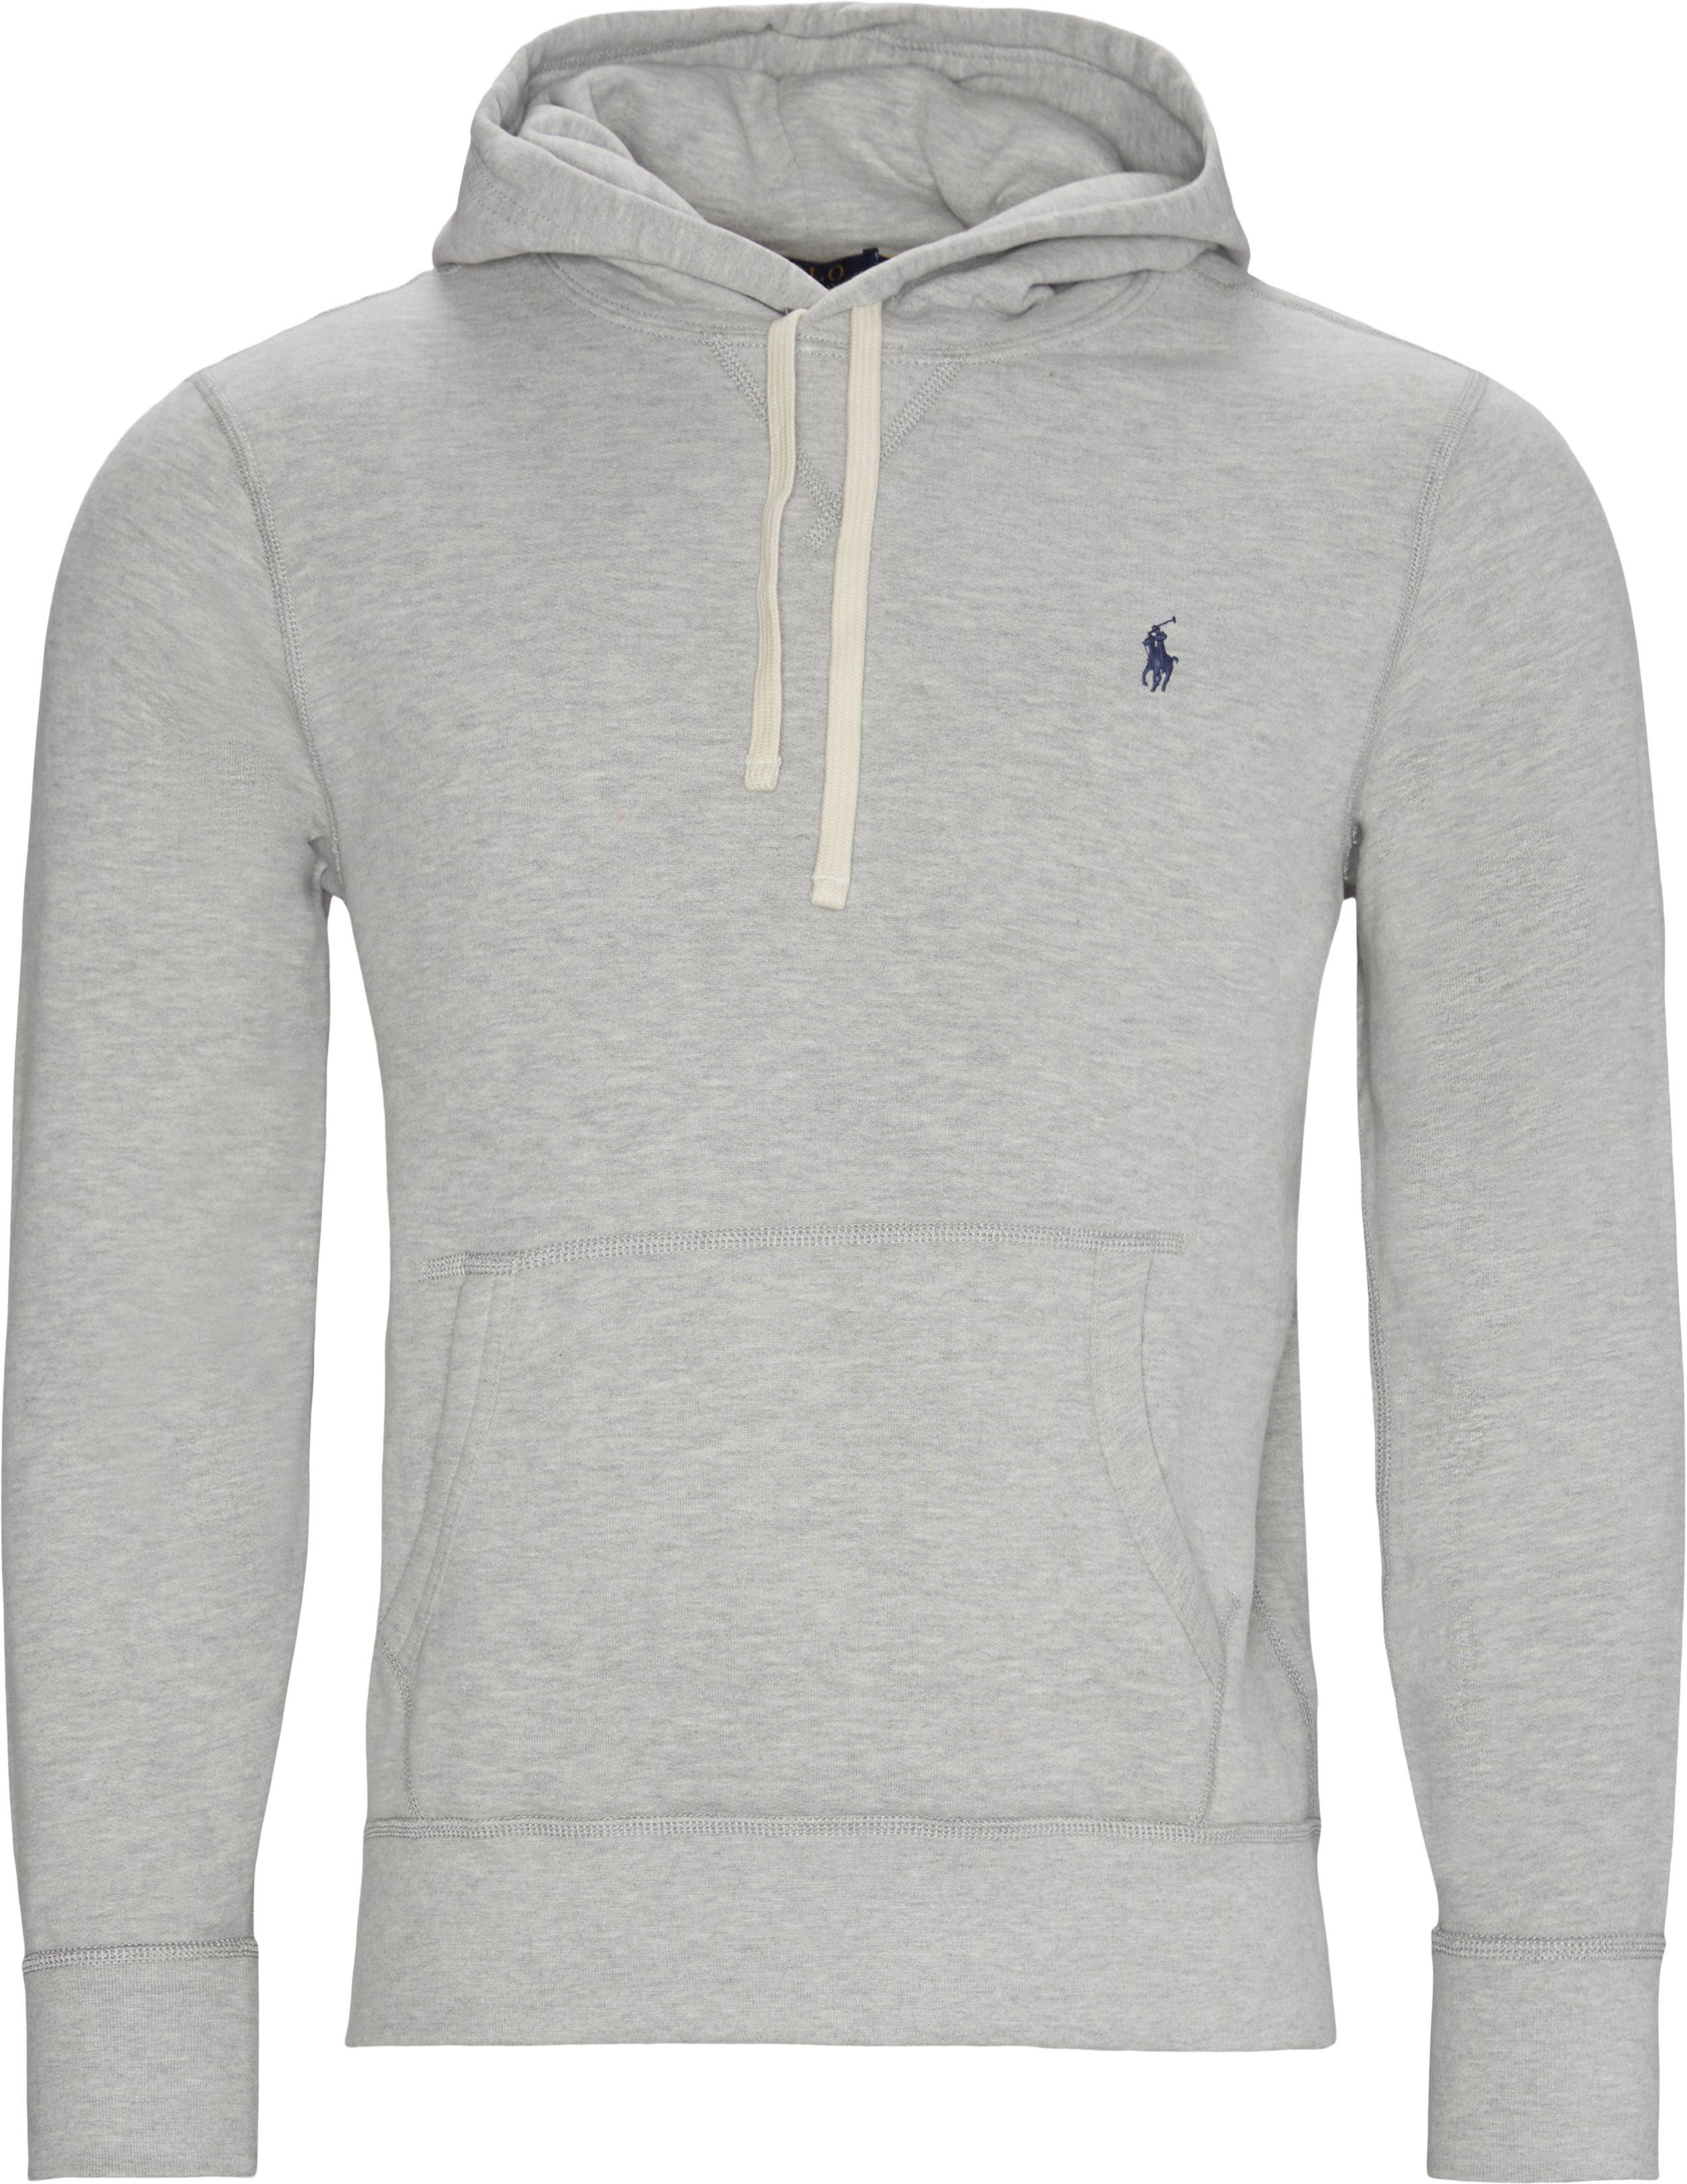 Logo Hoodie - Sweatshirts - Regular - Grey